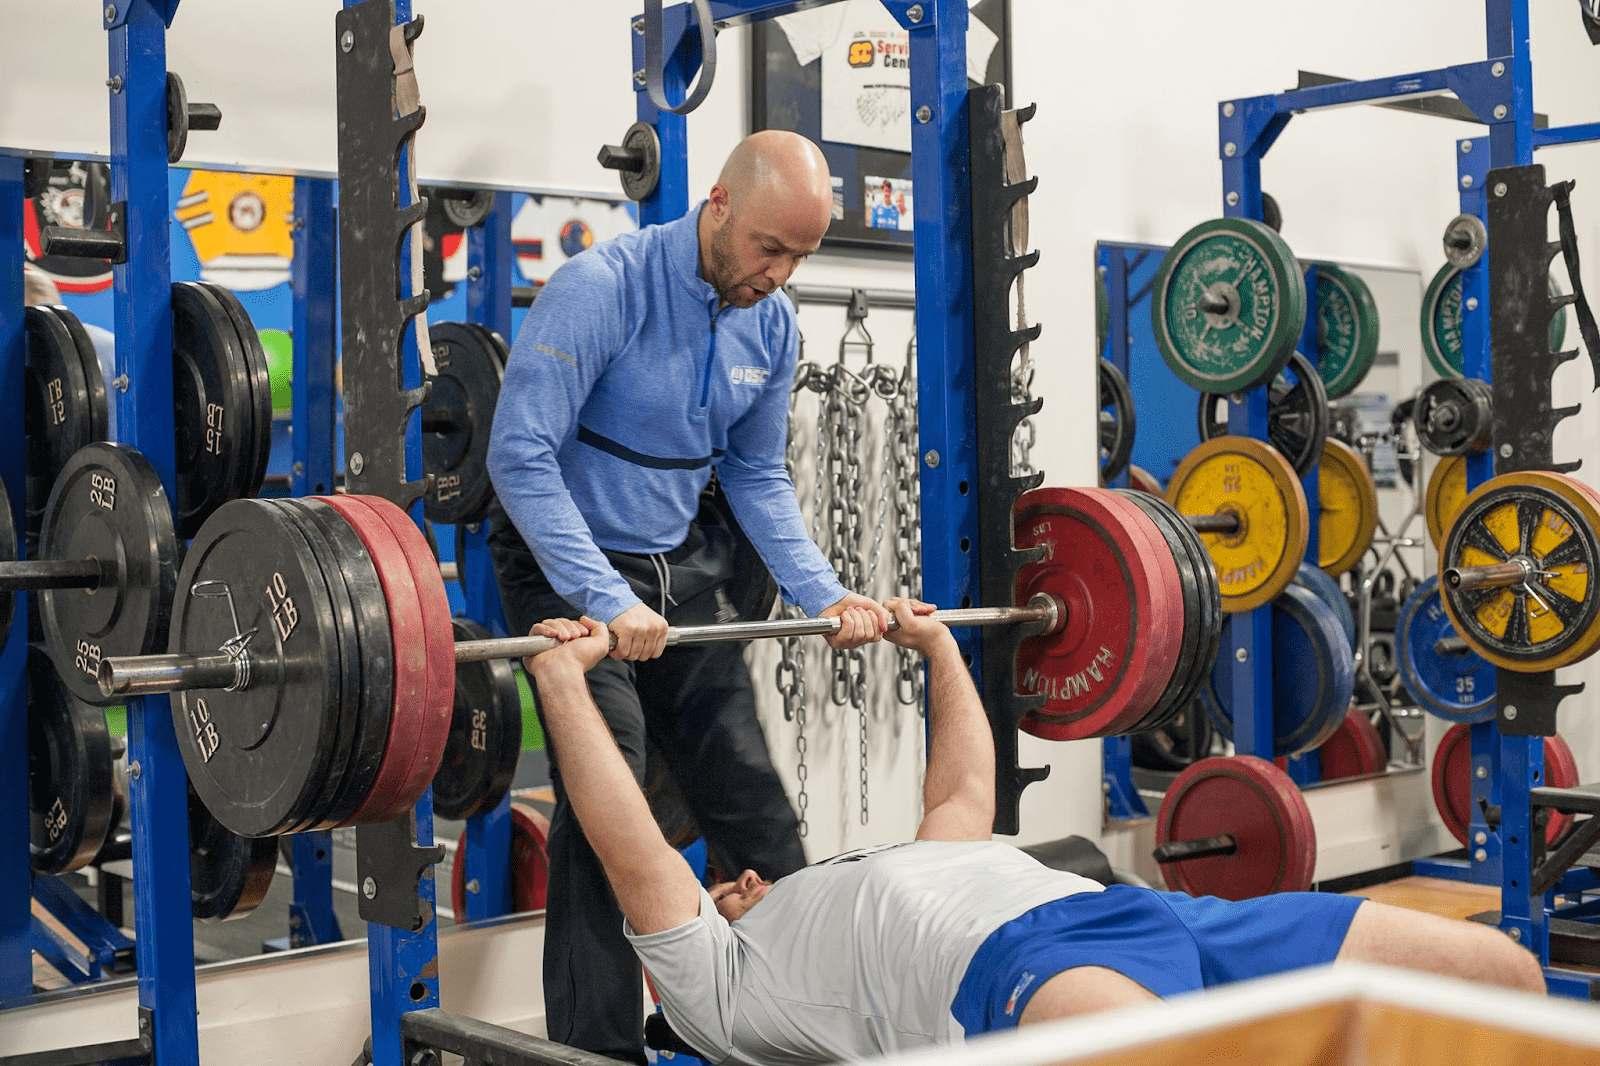 Trainer spotting man bench pressing